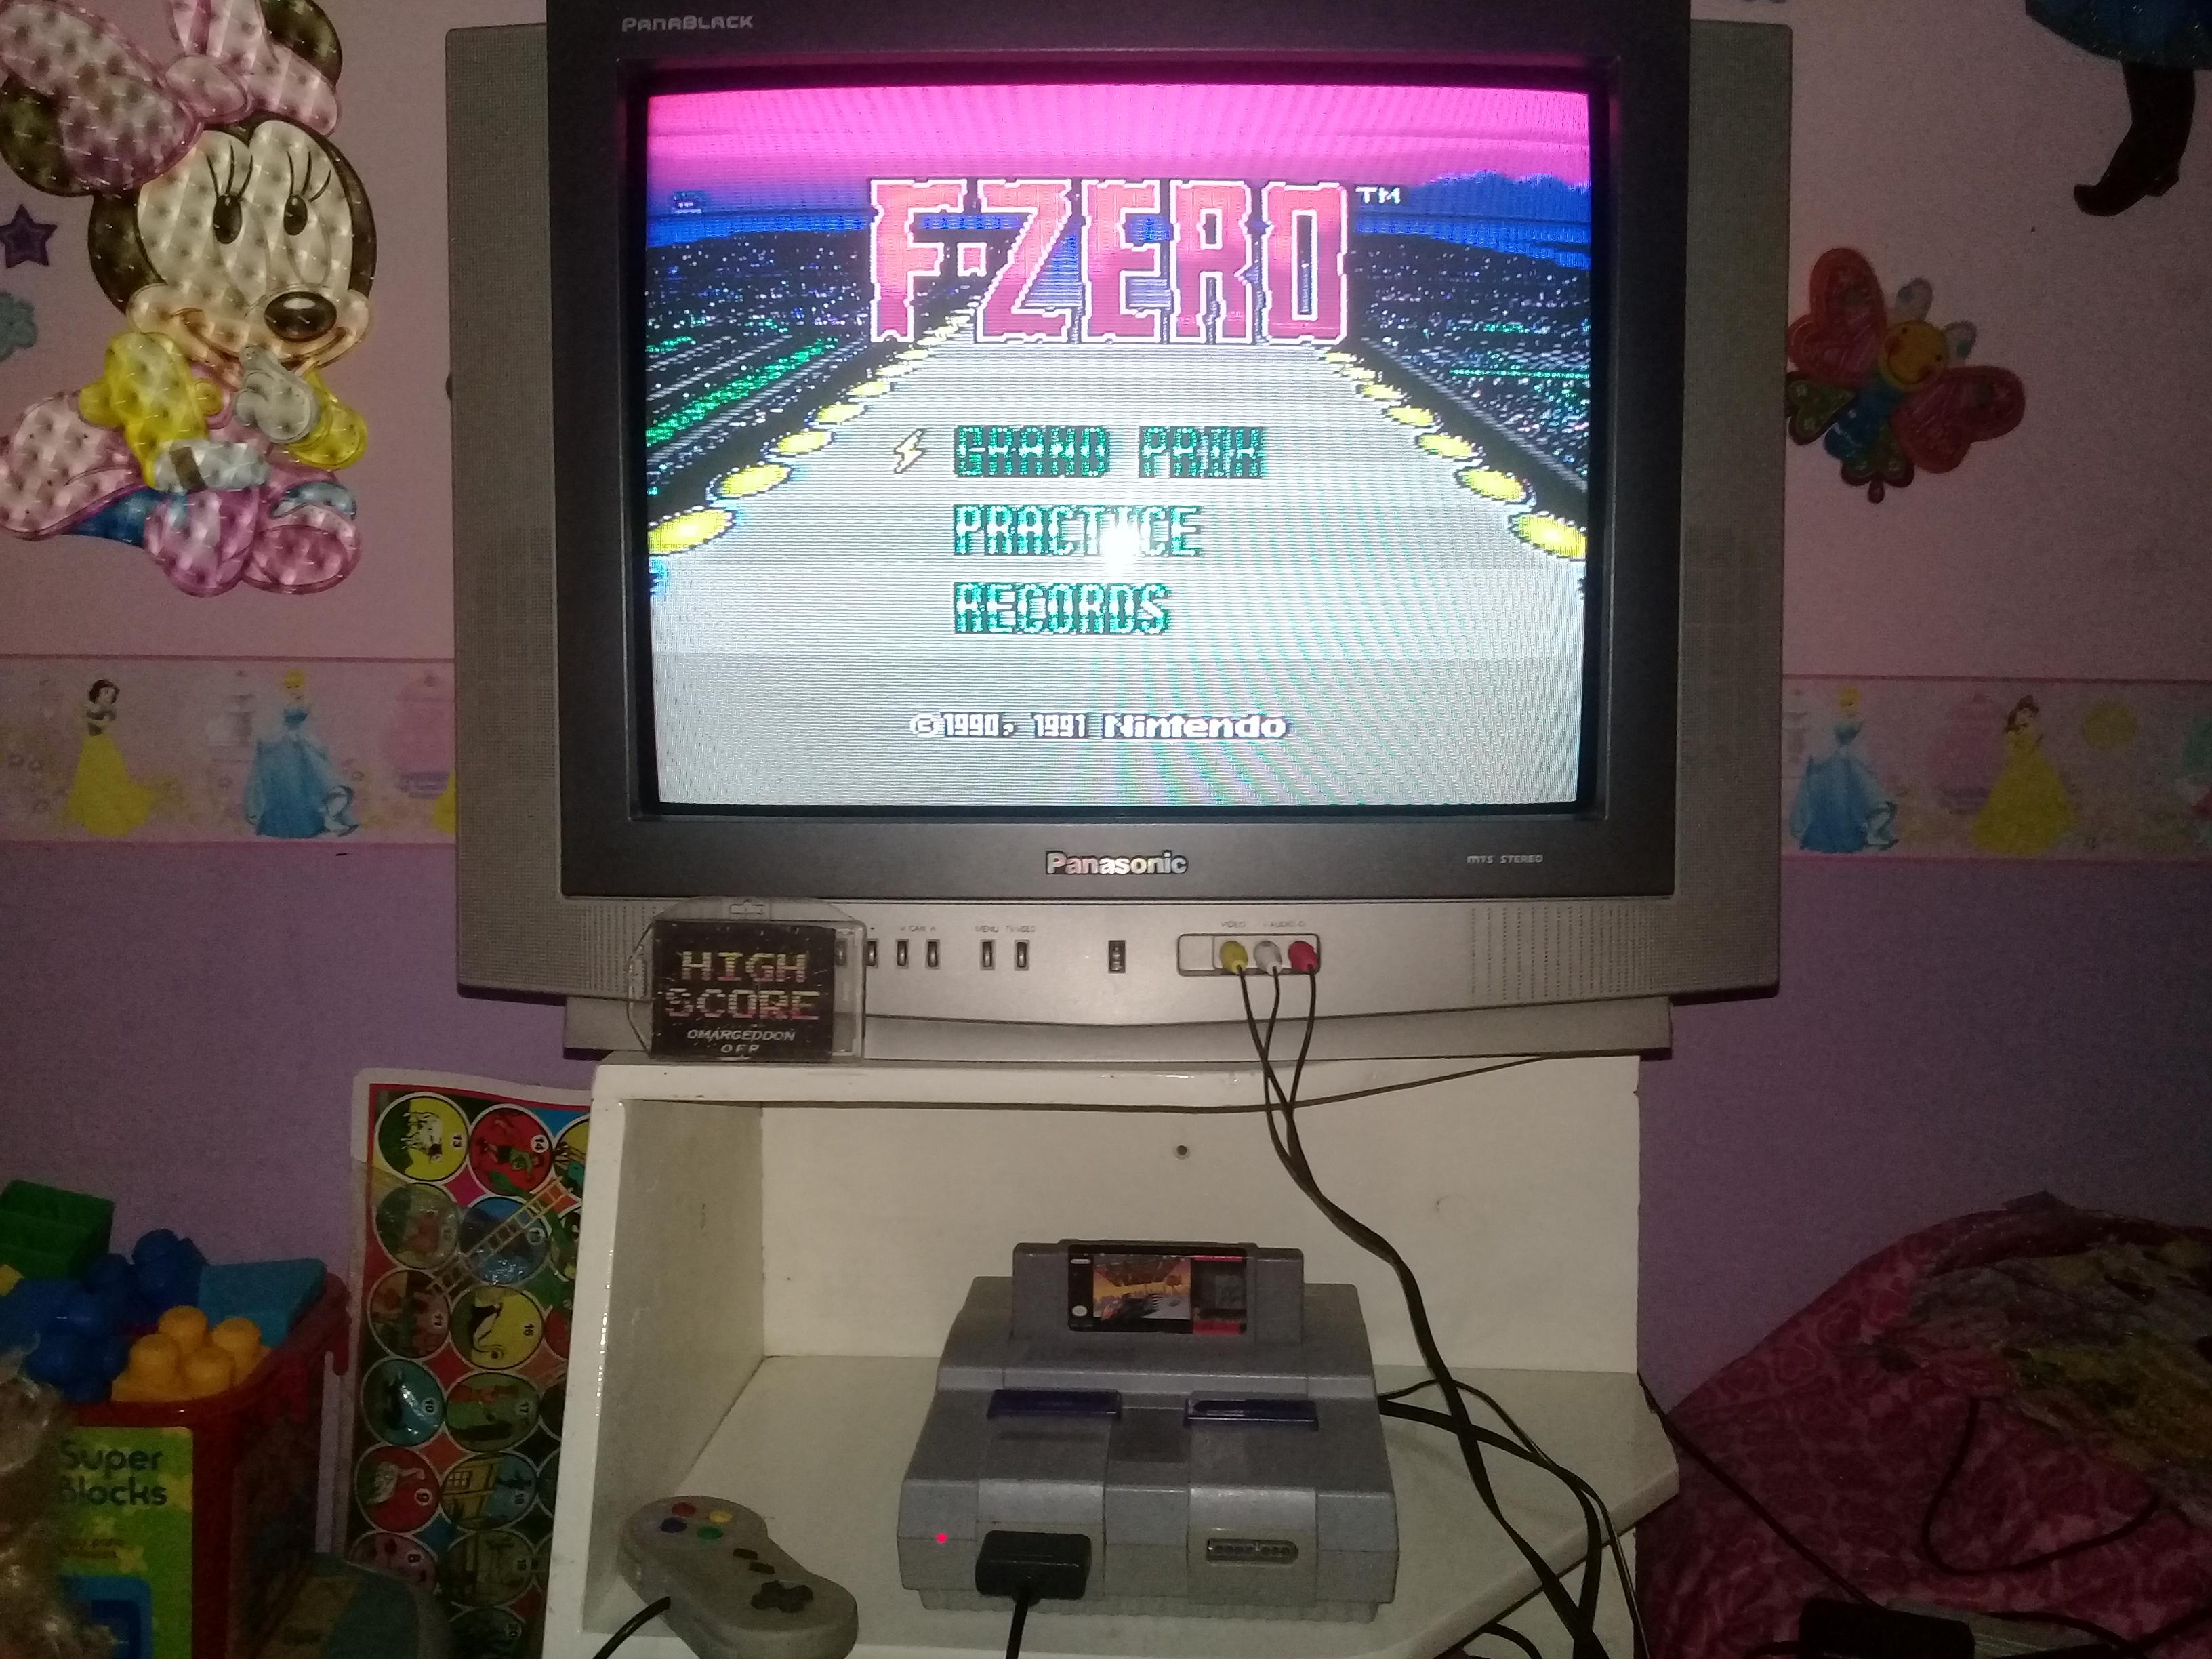 omargeddon: F-Zero: Big Blue [Beginner] (SNES/Super Famicom) 0:02:16.73 points on 2019-06-14 12:24:51